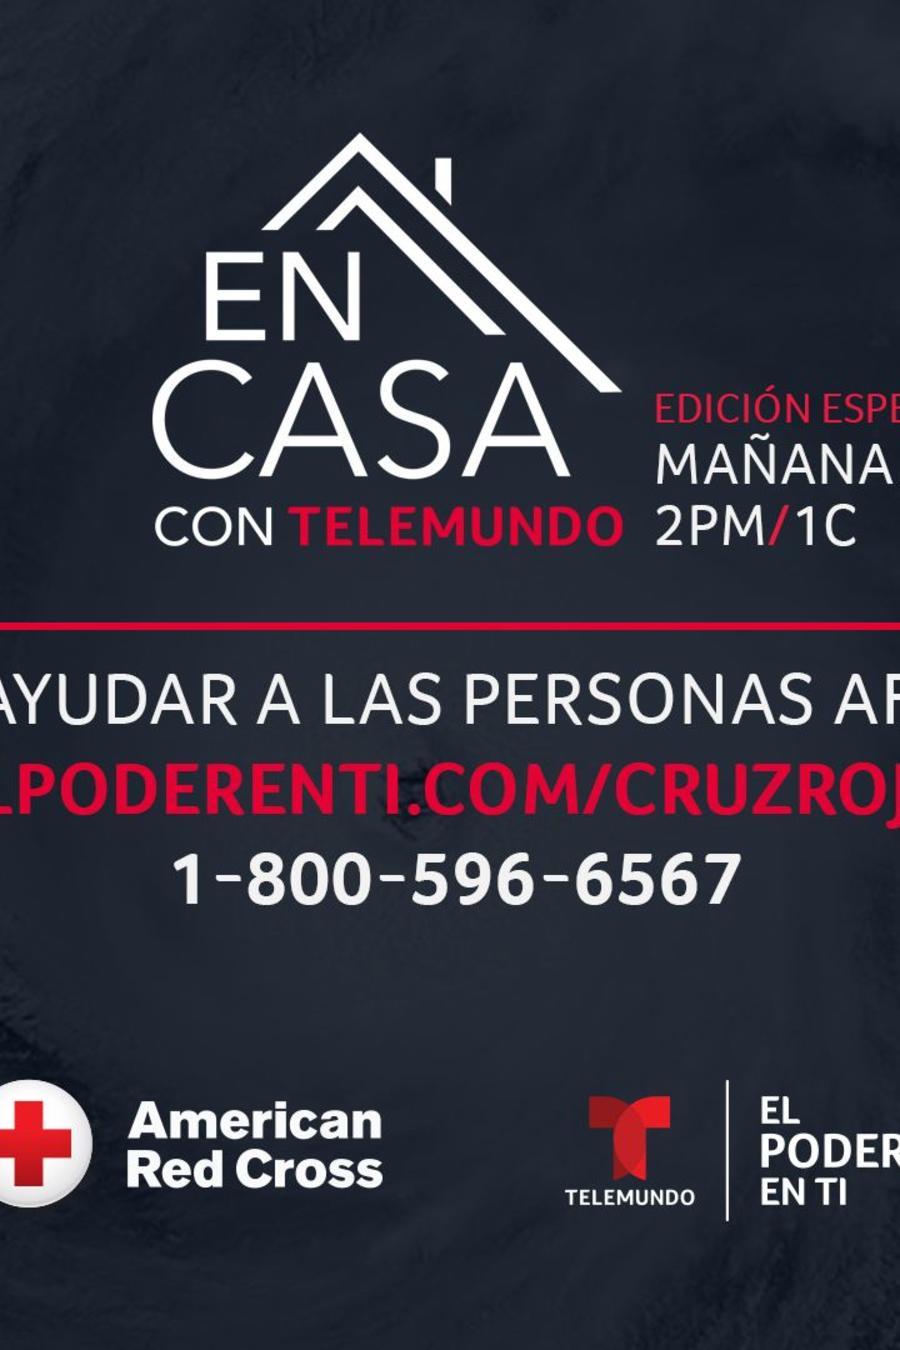 En_Casa_Con_Telemundo_especial